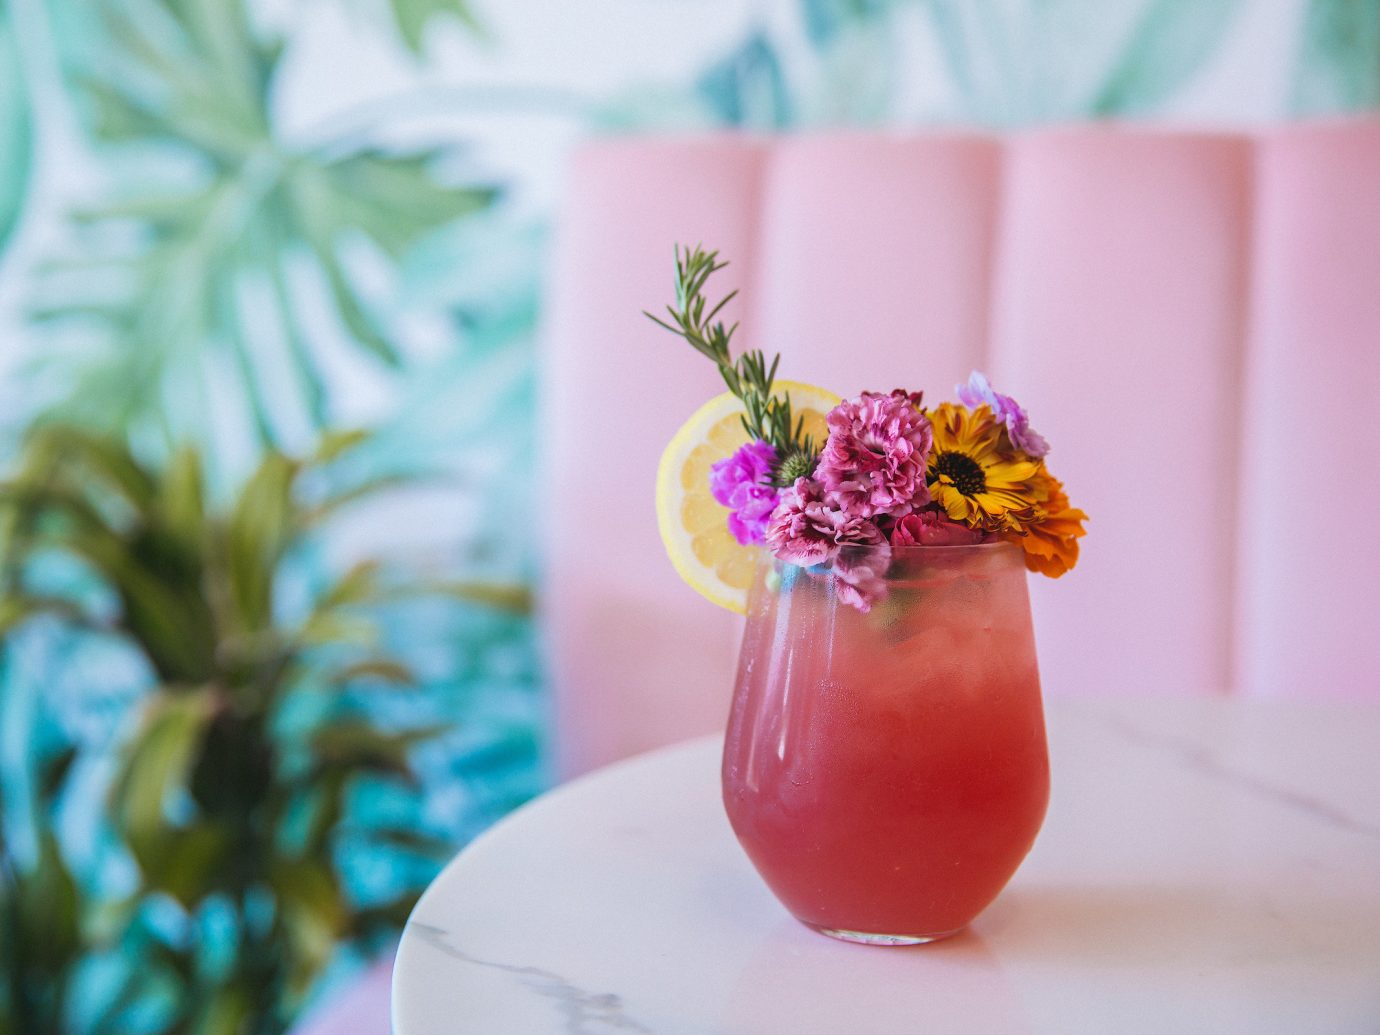 Jetsetter Guides flower plant Drink petal still life photography